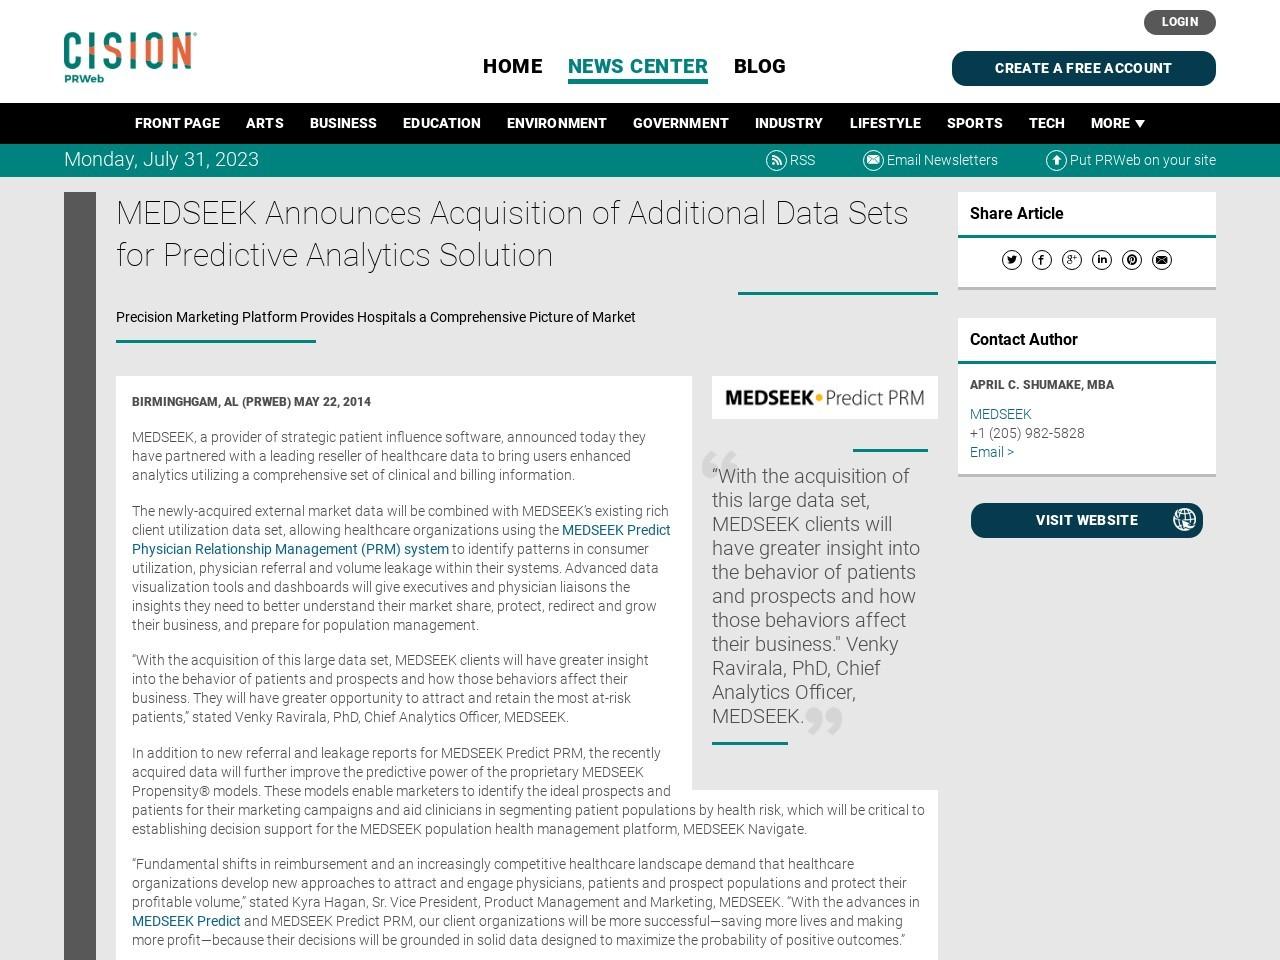 MEDSEEK Announces Acquisition of Additional Data Sets for Predictive …